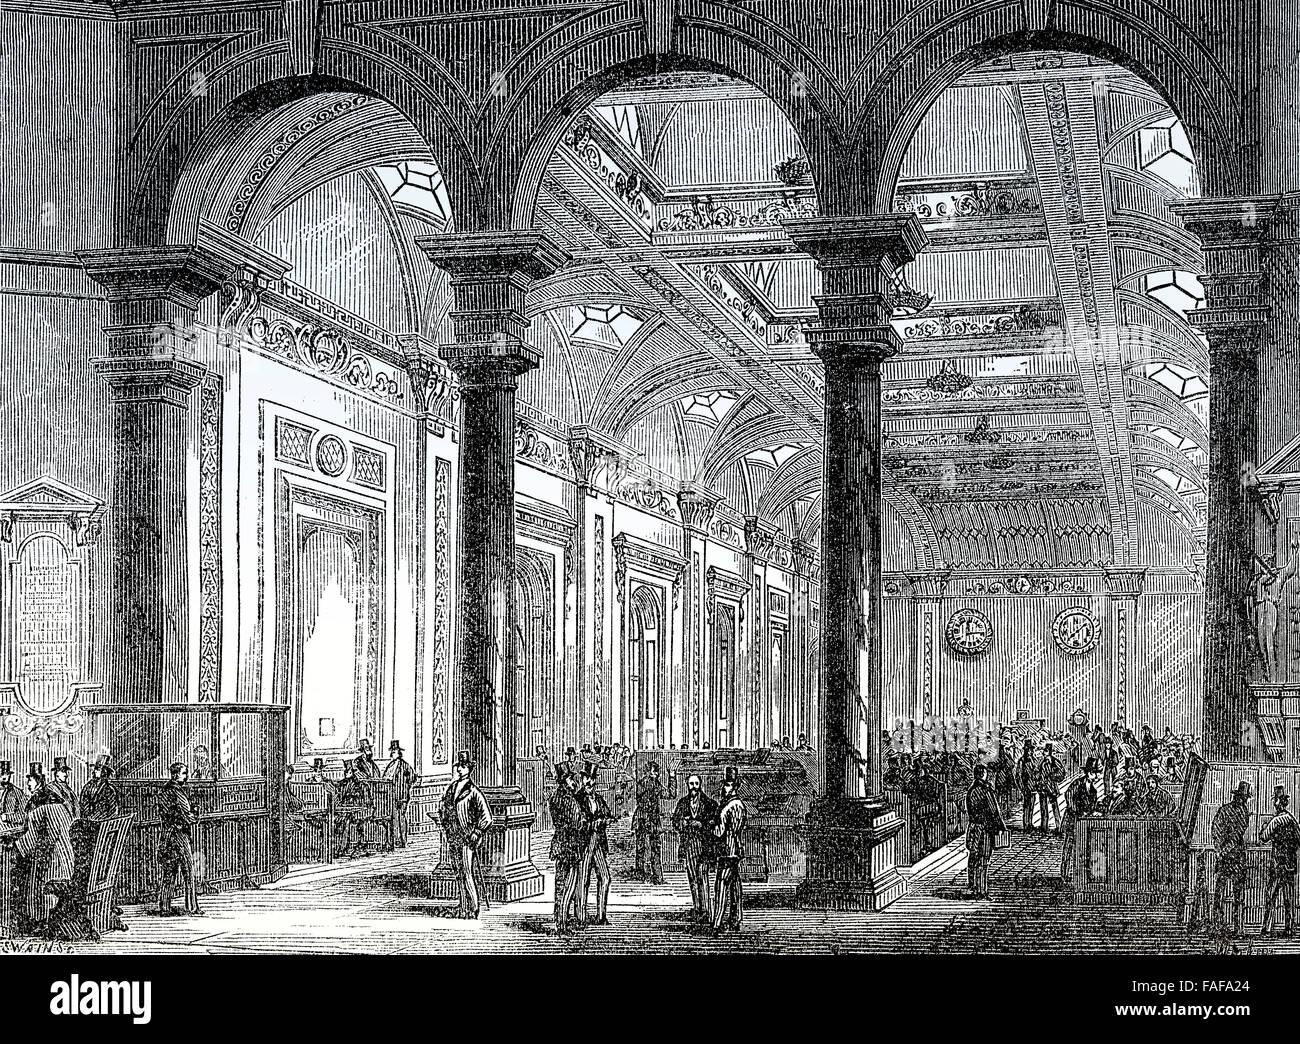 Interior of Lloyd's of London, 18th century,  an insurance market, City of London - Stock Image